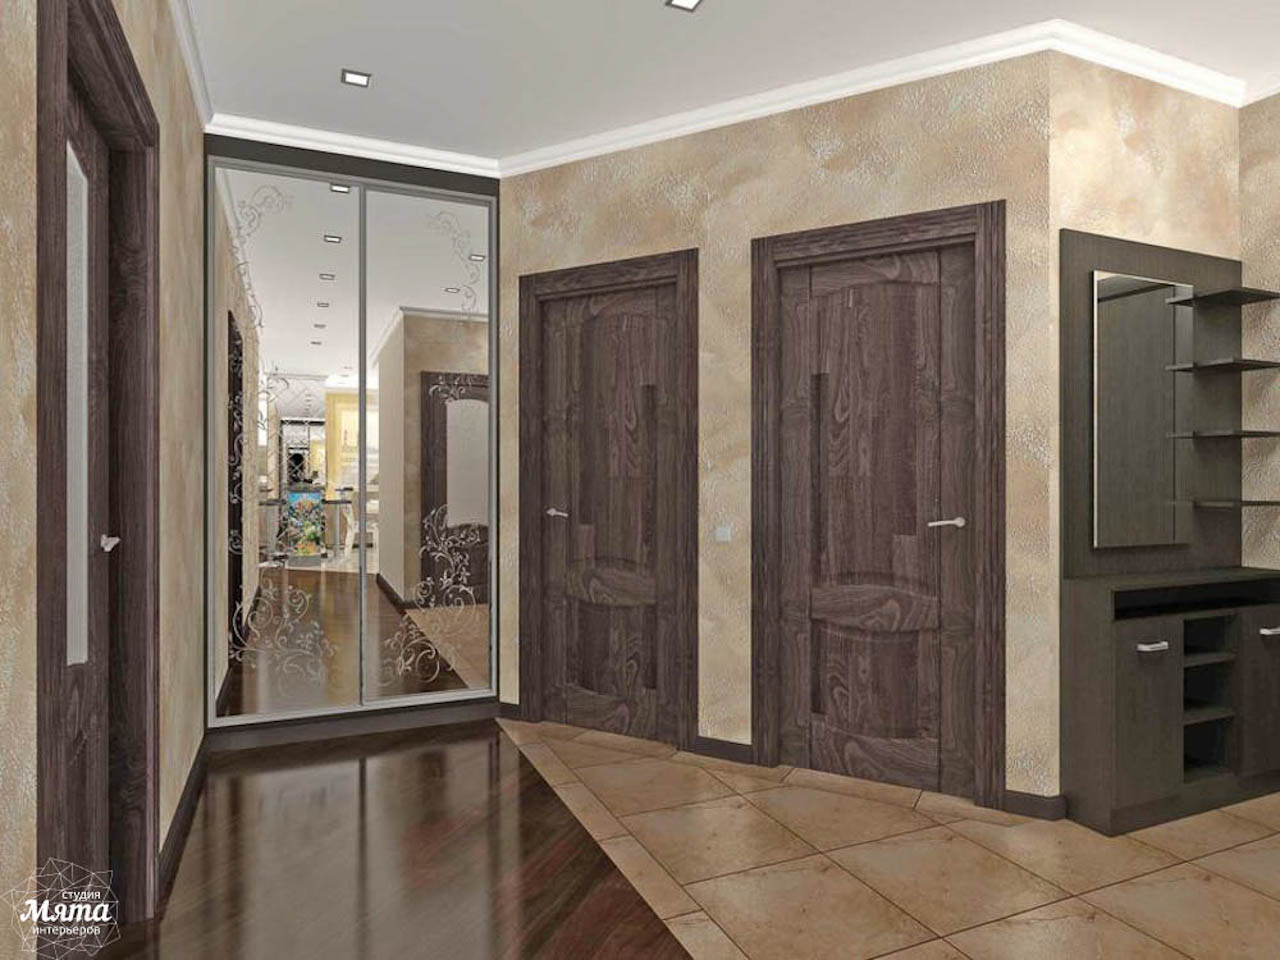 Дизайн интерьера двухкомнатной квартиры по ул. Юмашева 10 img1206790968